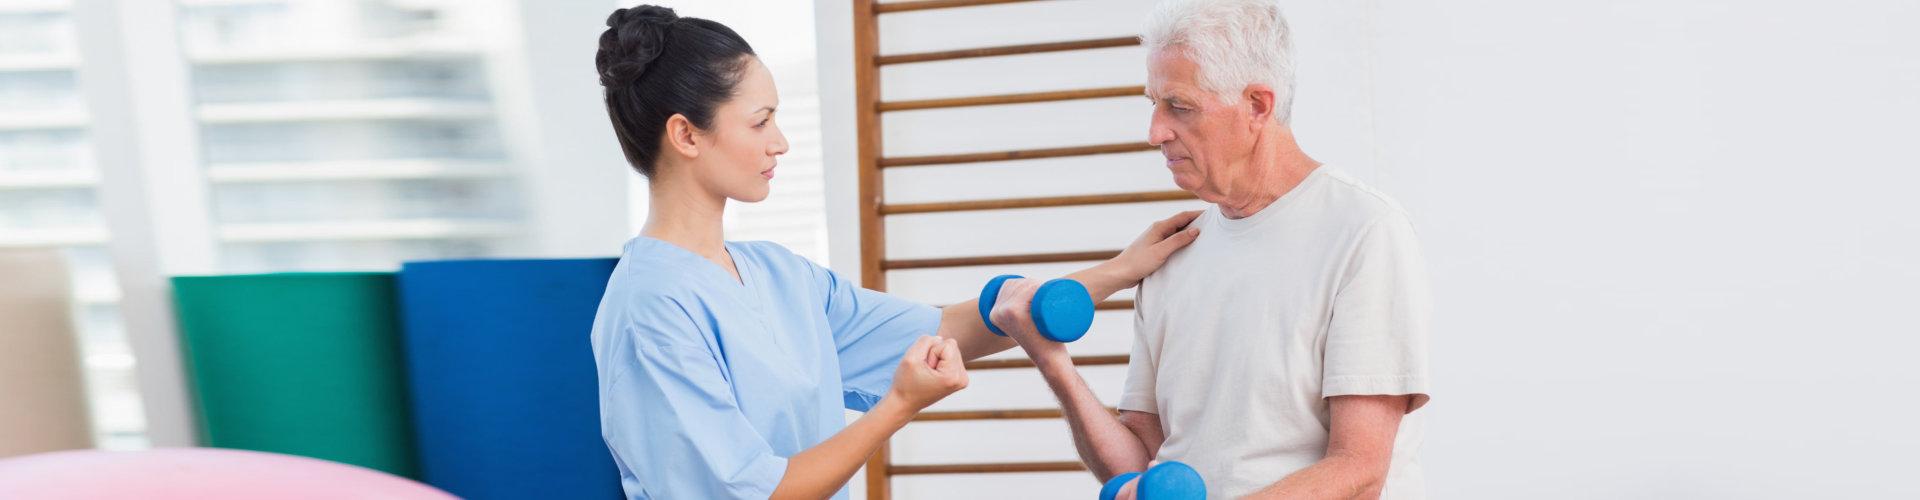 lady caregiver assisting senior man